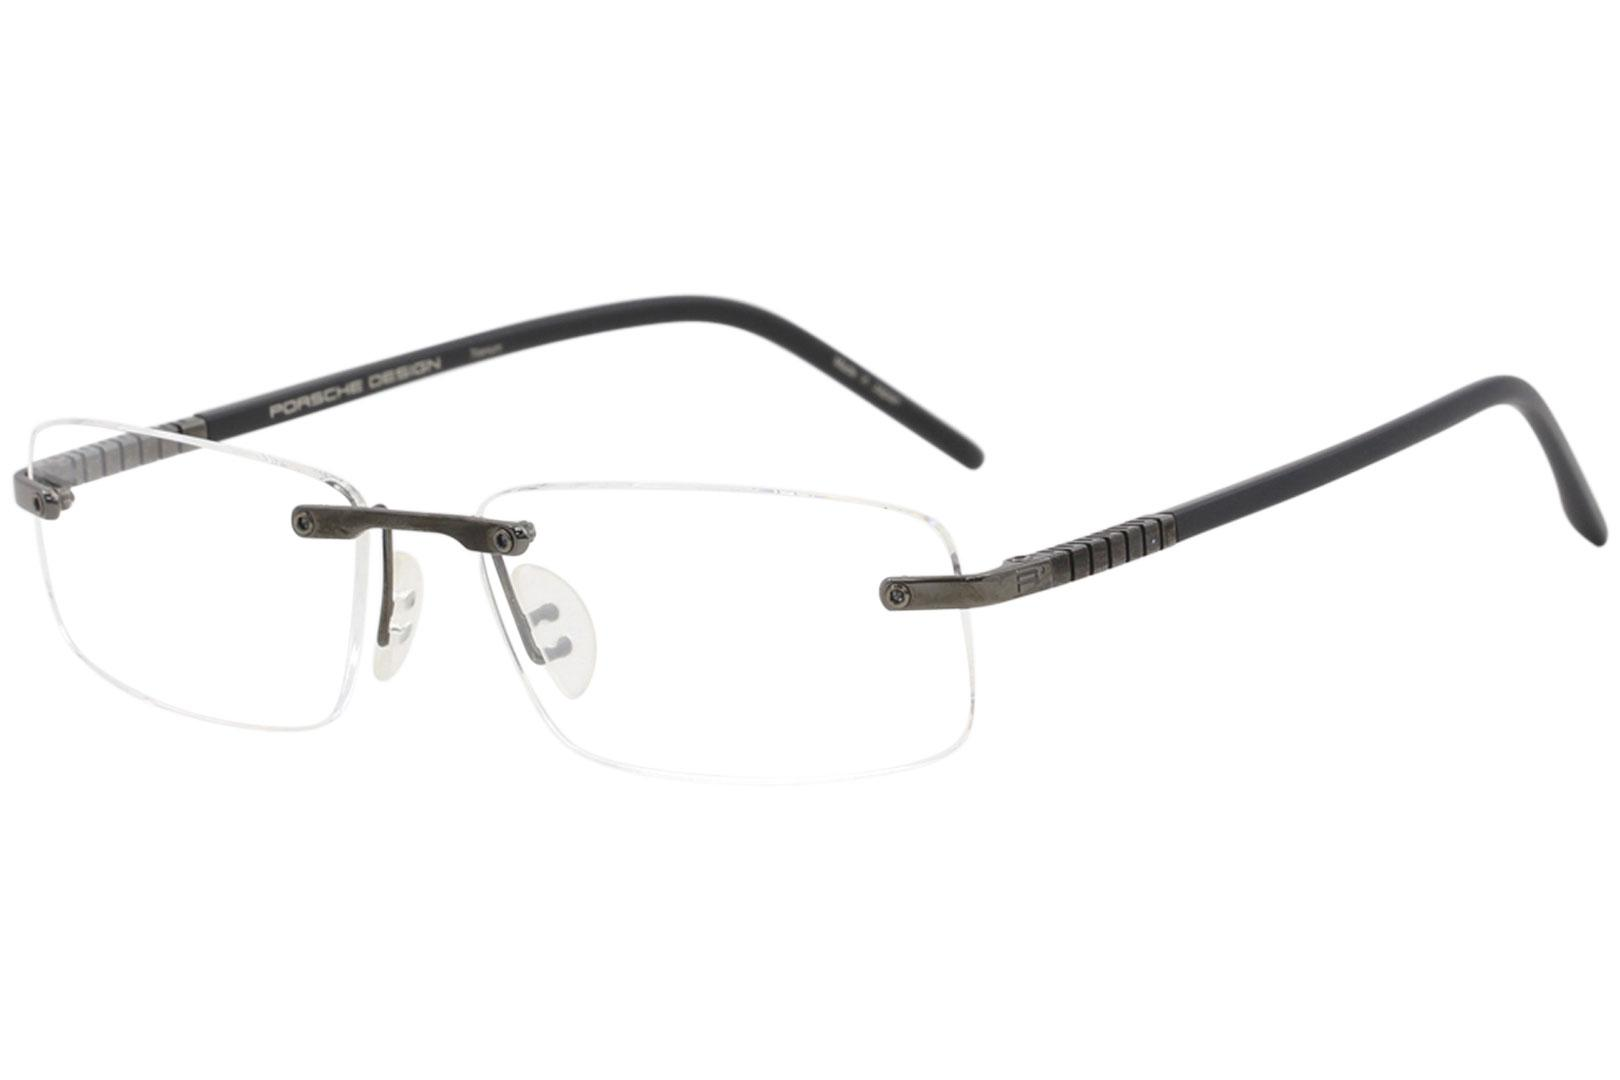 ed5f2243f22 Porsche Design Men s Eyeglasses P8144 P 8144 Rimless Titanium Optical Frame  by Porsche Design